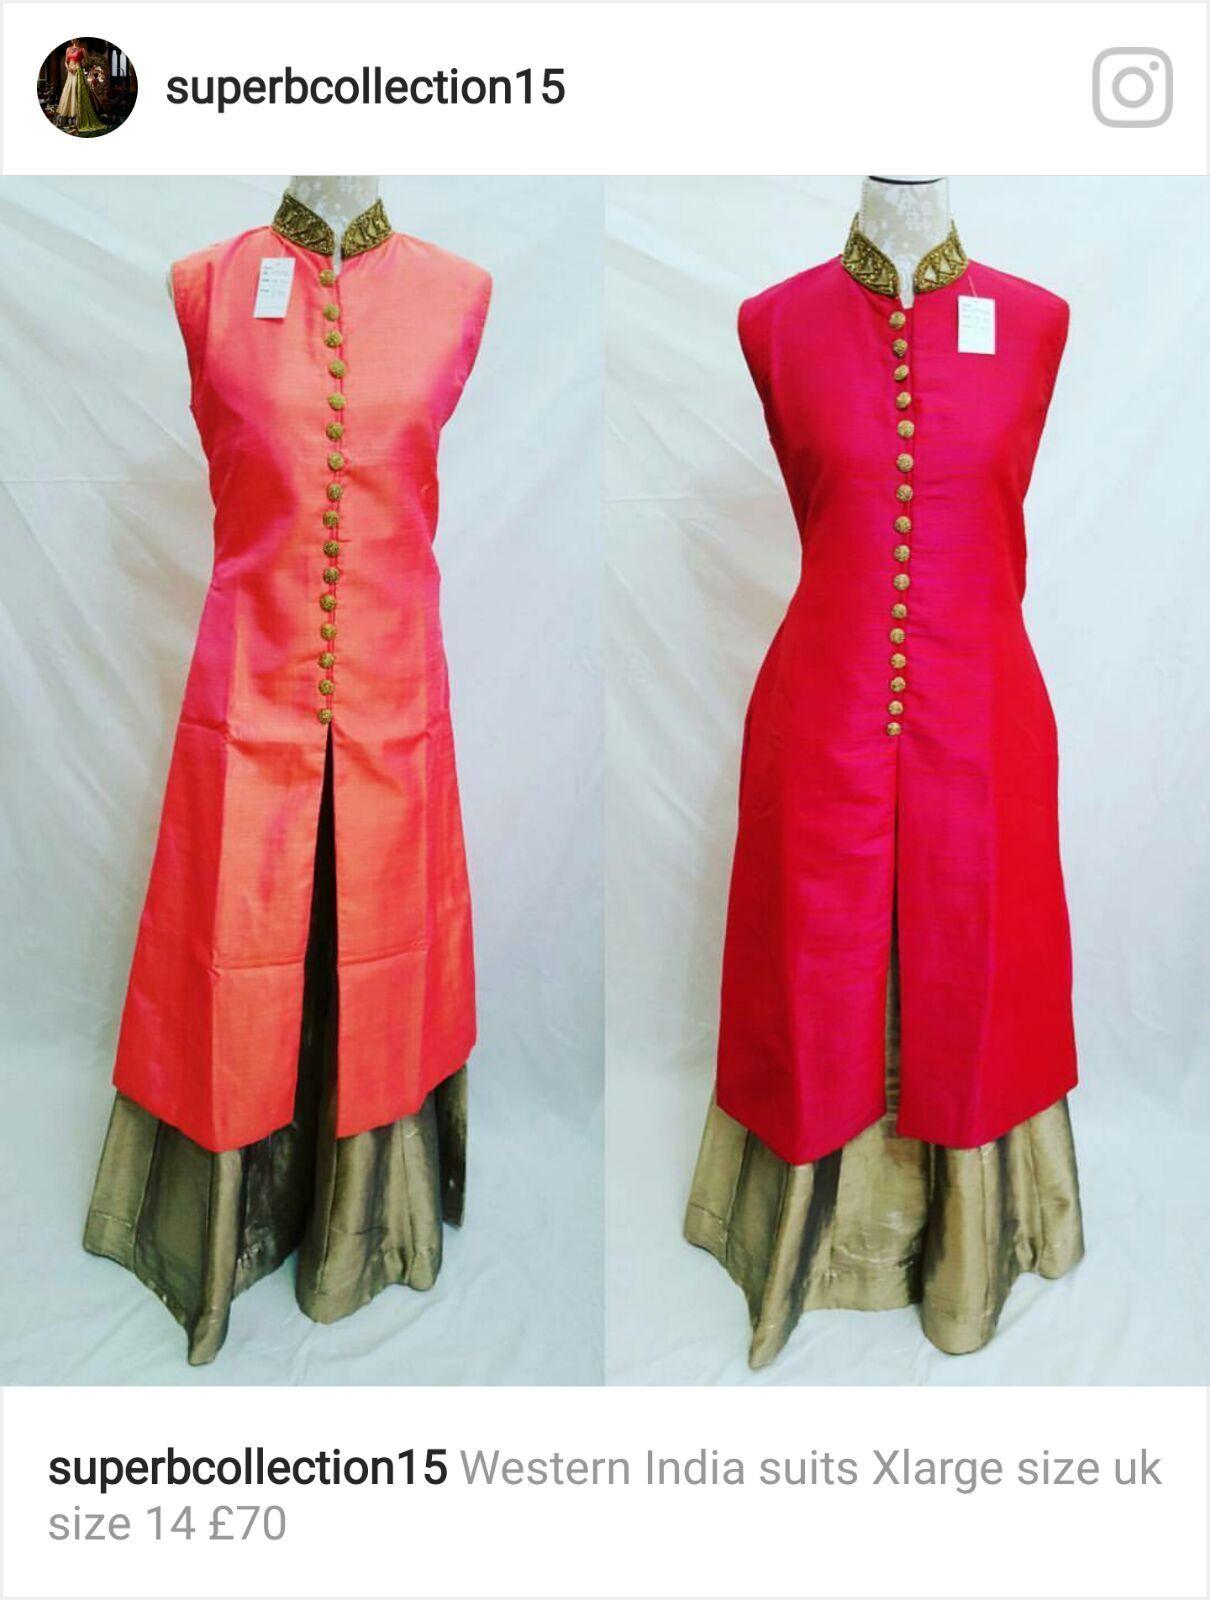 INDIAN LUNGHEZZA bollywod Designer khameez PAVIMENTO LUNGHEZZA INDIAN ABITO  DA INDO occidentali materiale di seta 8cc0d0 d4dfe6654bb